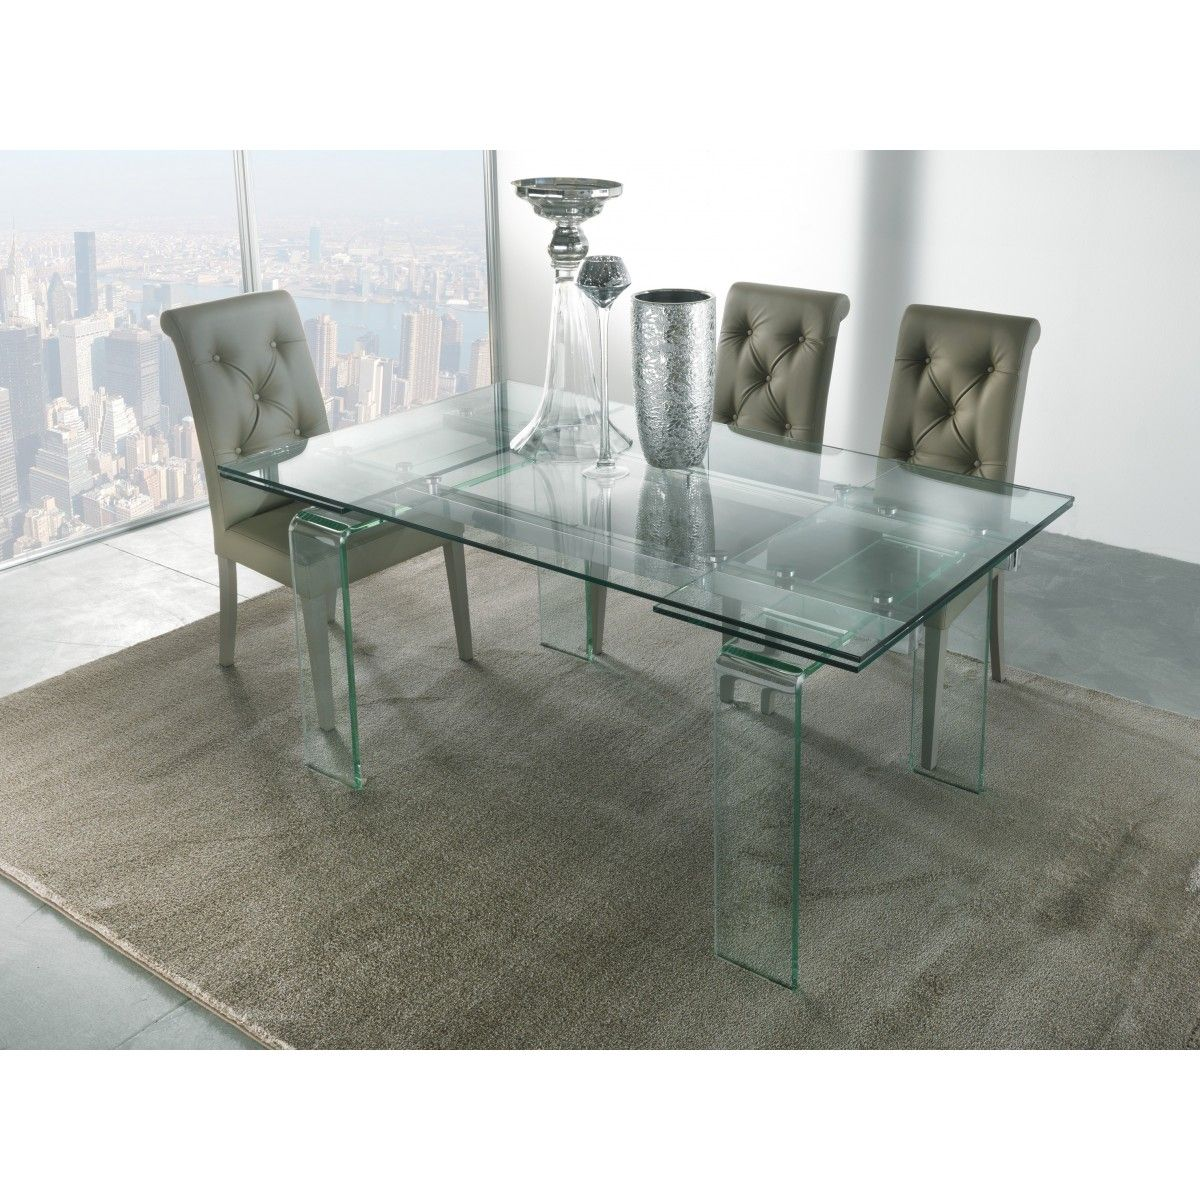 tavolo vetro allungabile glass art 676 la seggiola